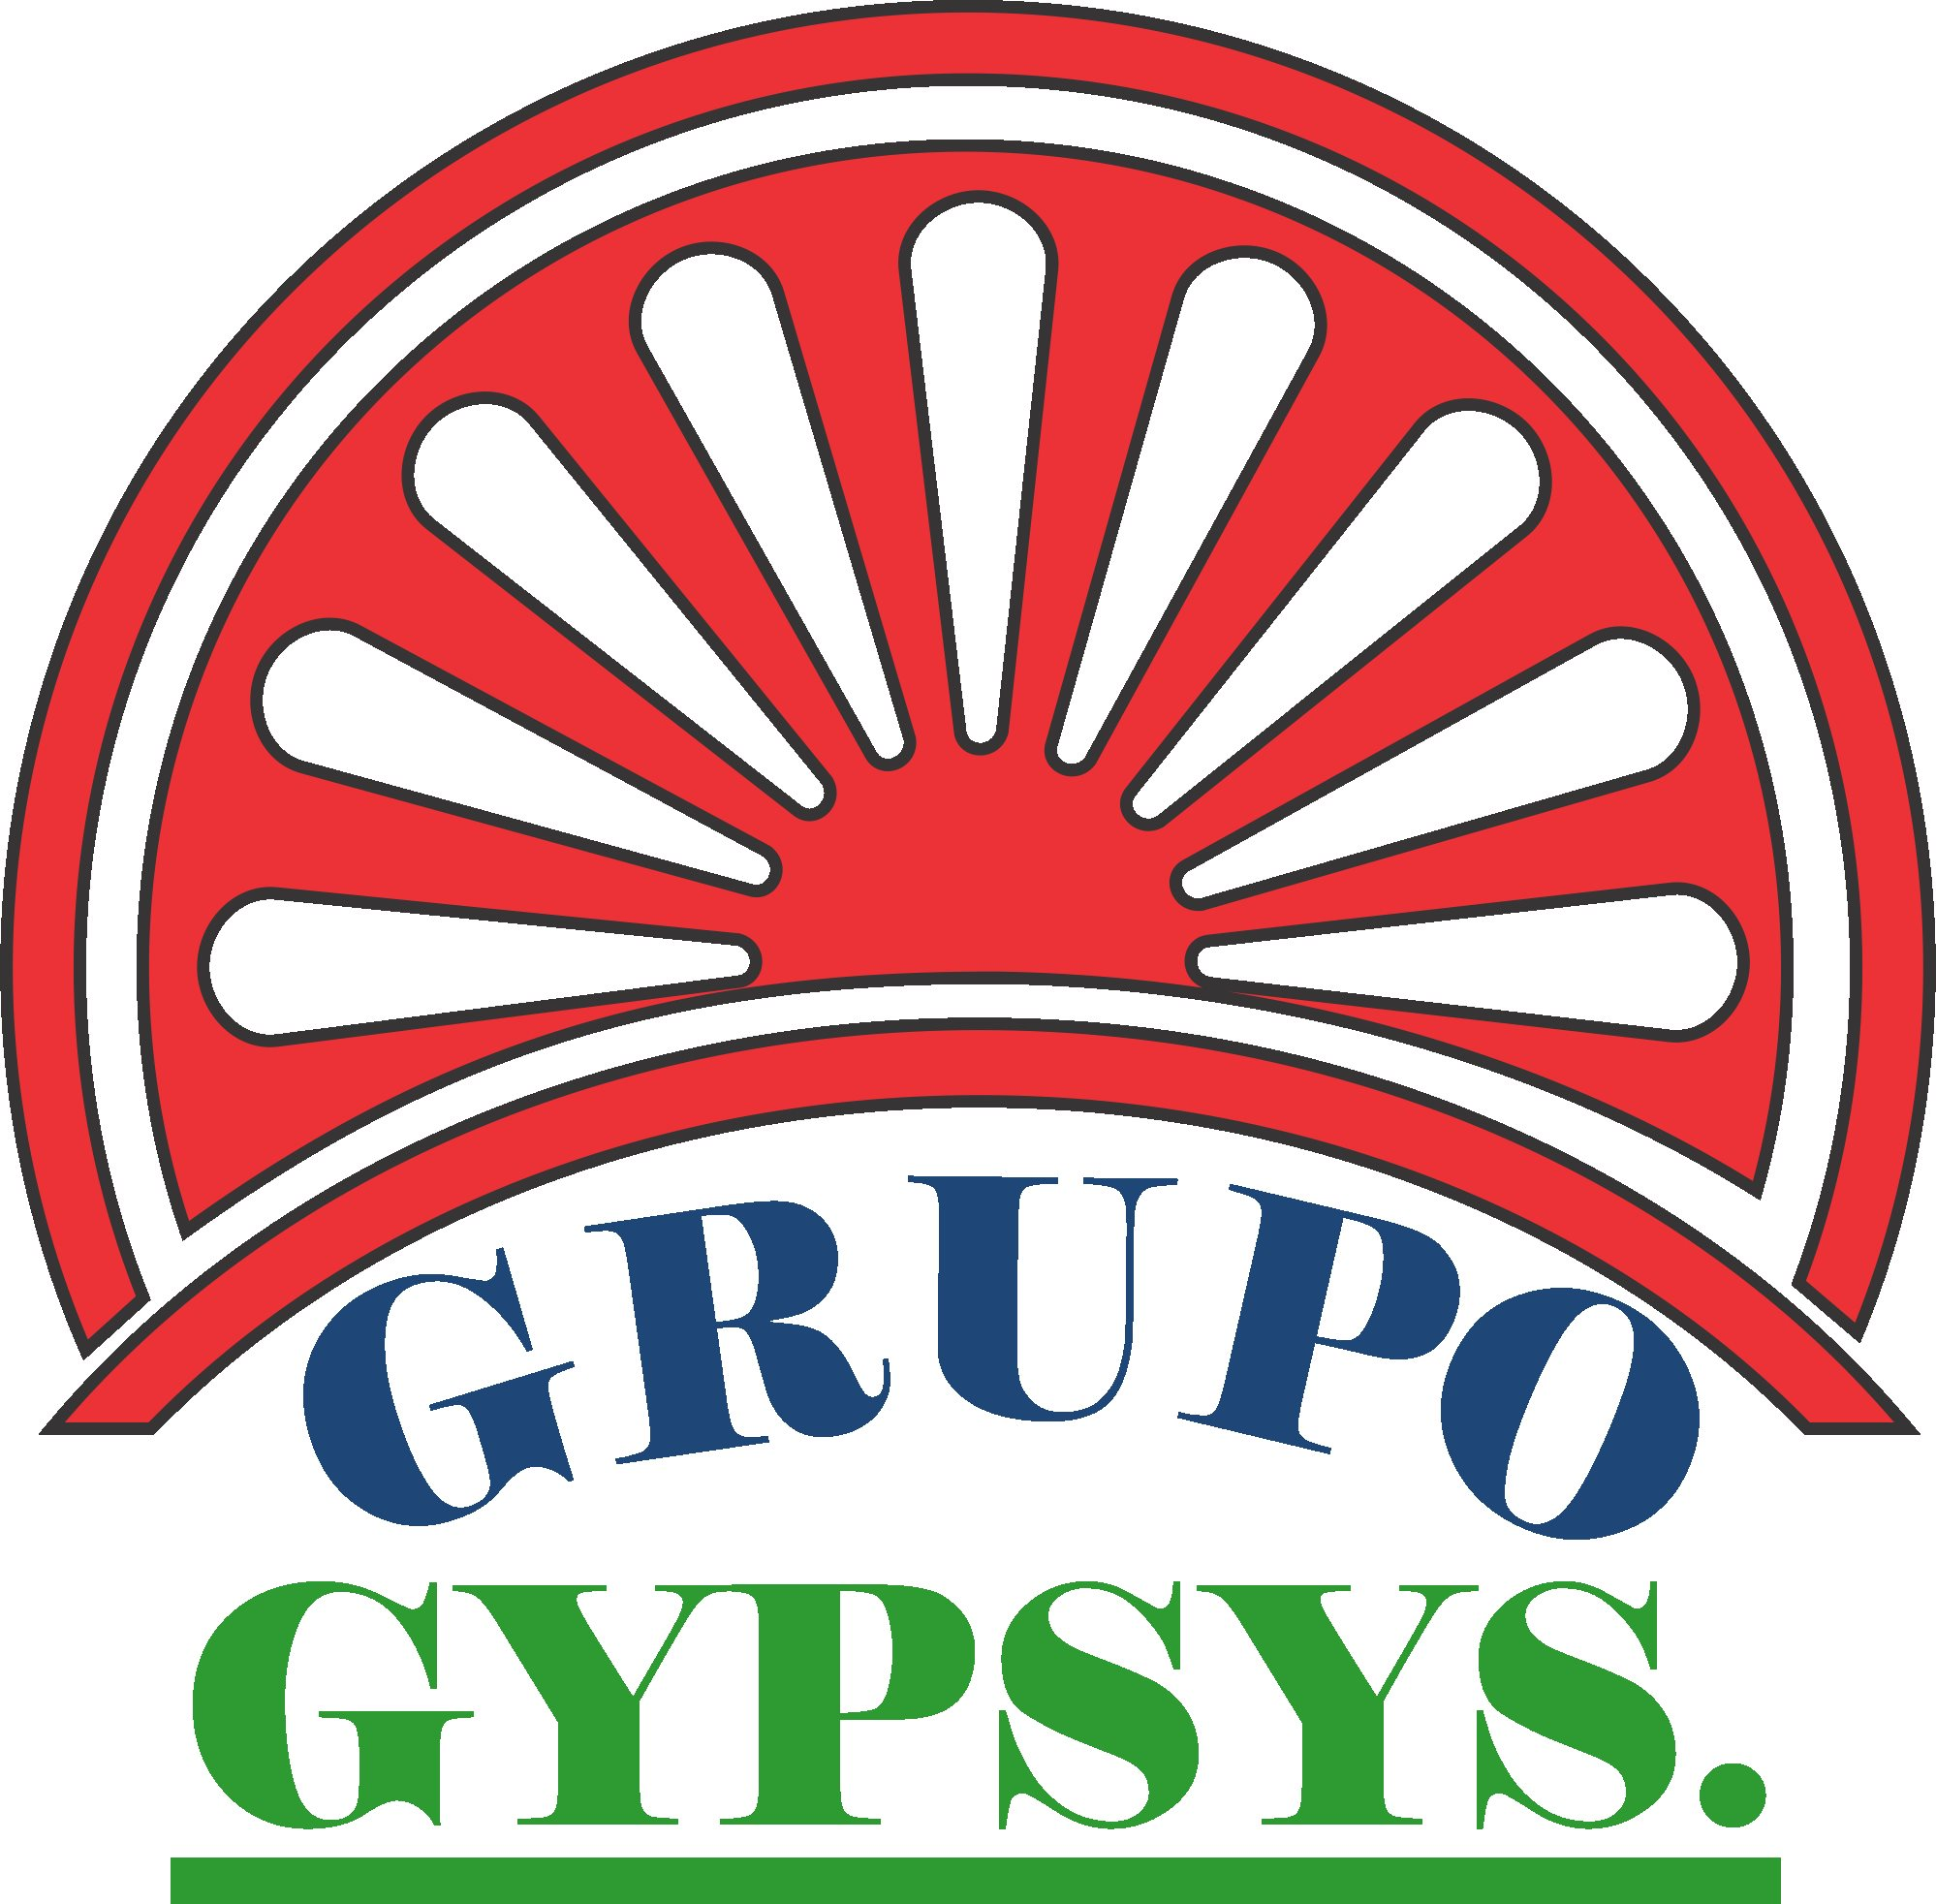 GRUPO GYPSYS